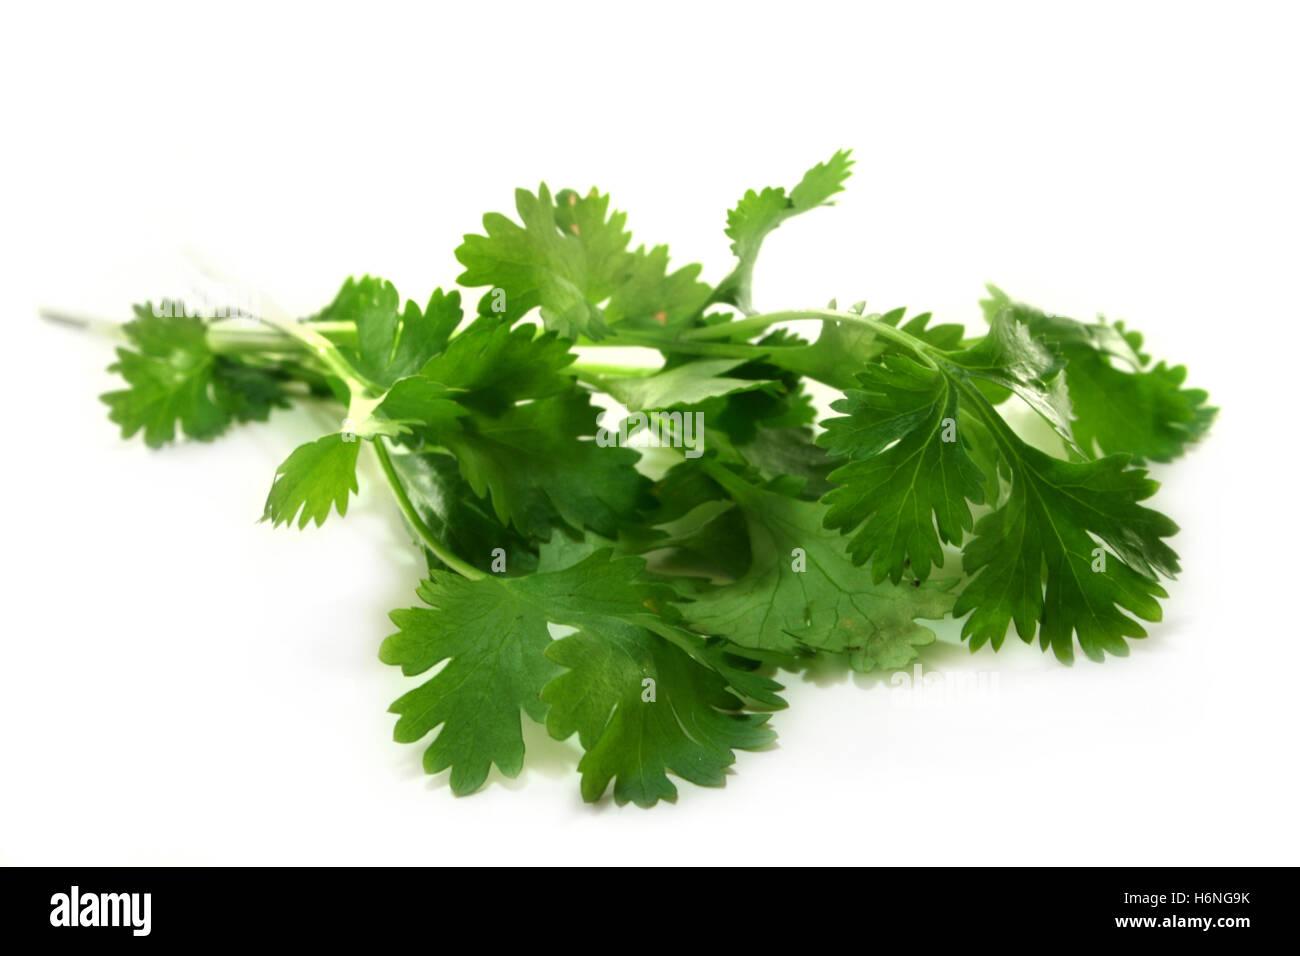 coriander - Stock Image